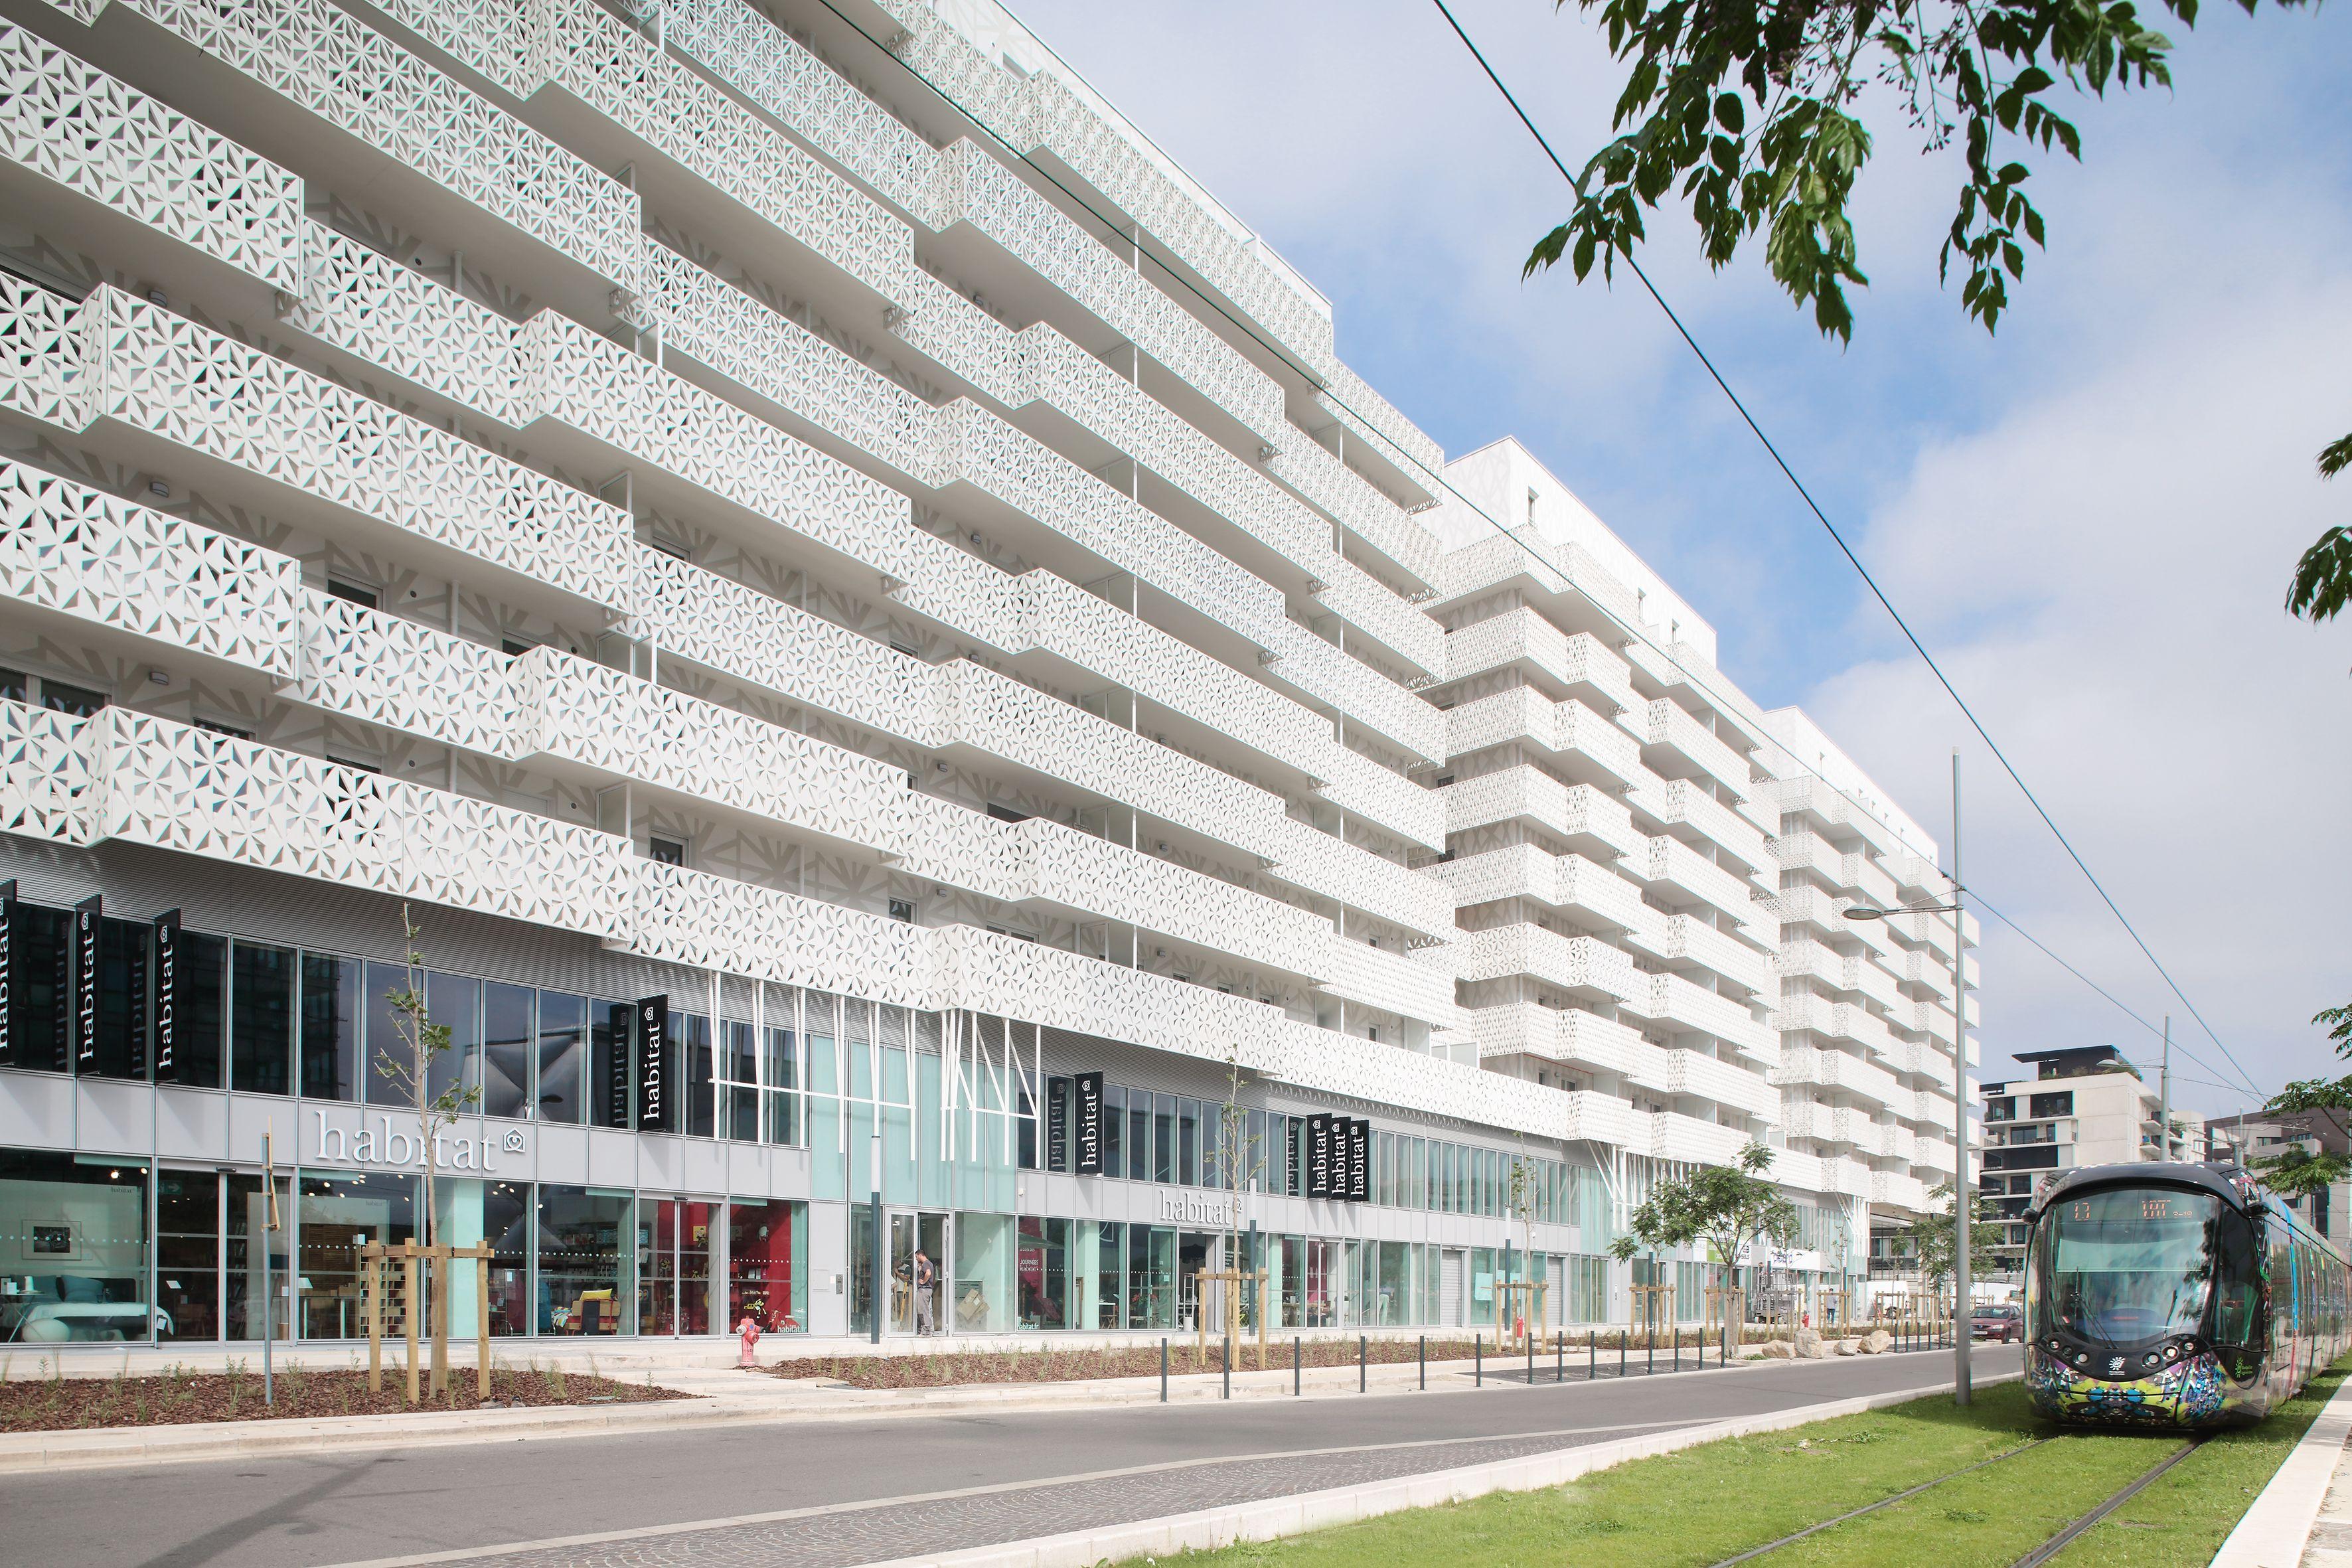 Port marianne quartier jacques coeur architecture - Agence immobiliere port marianne ...